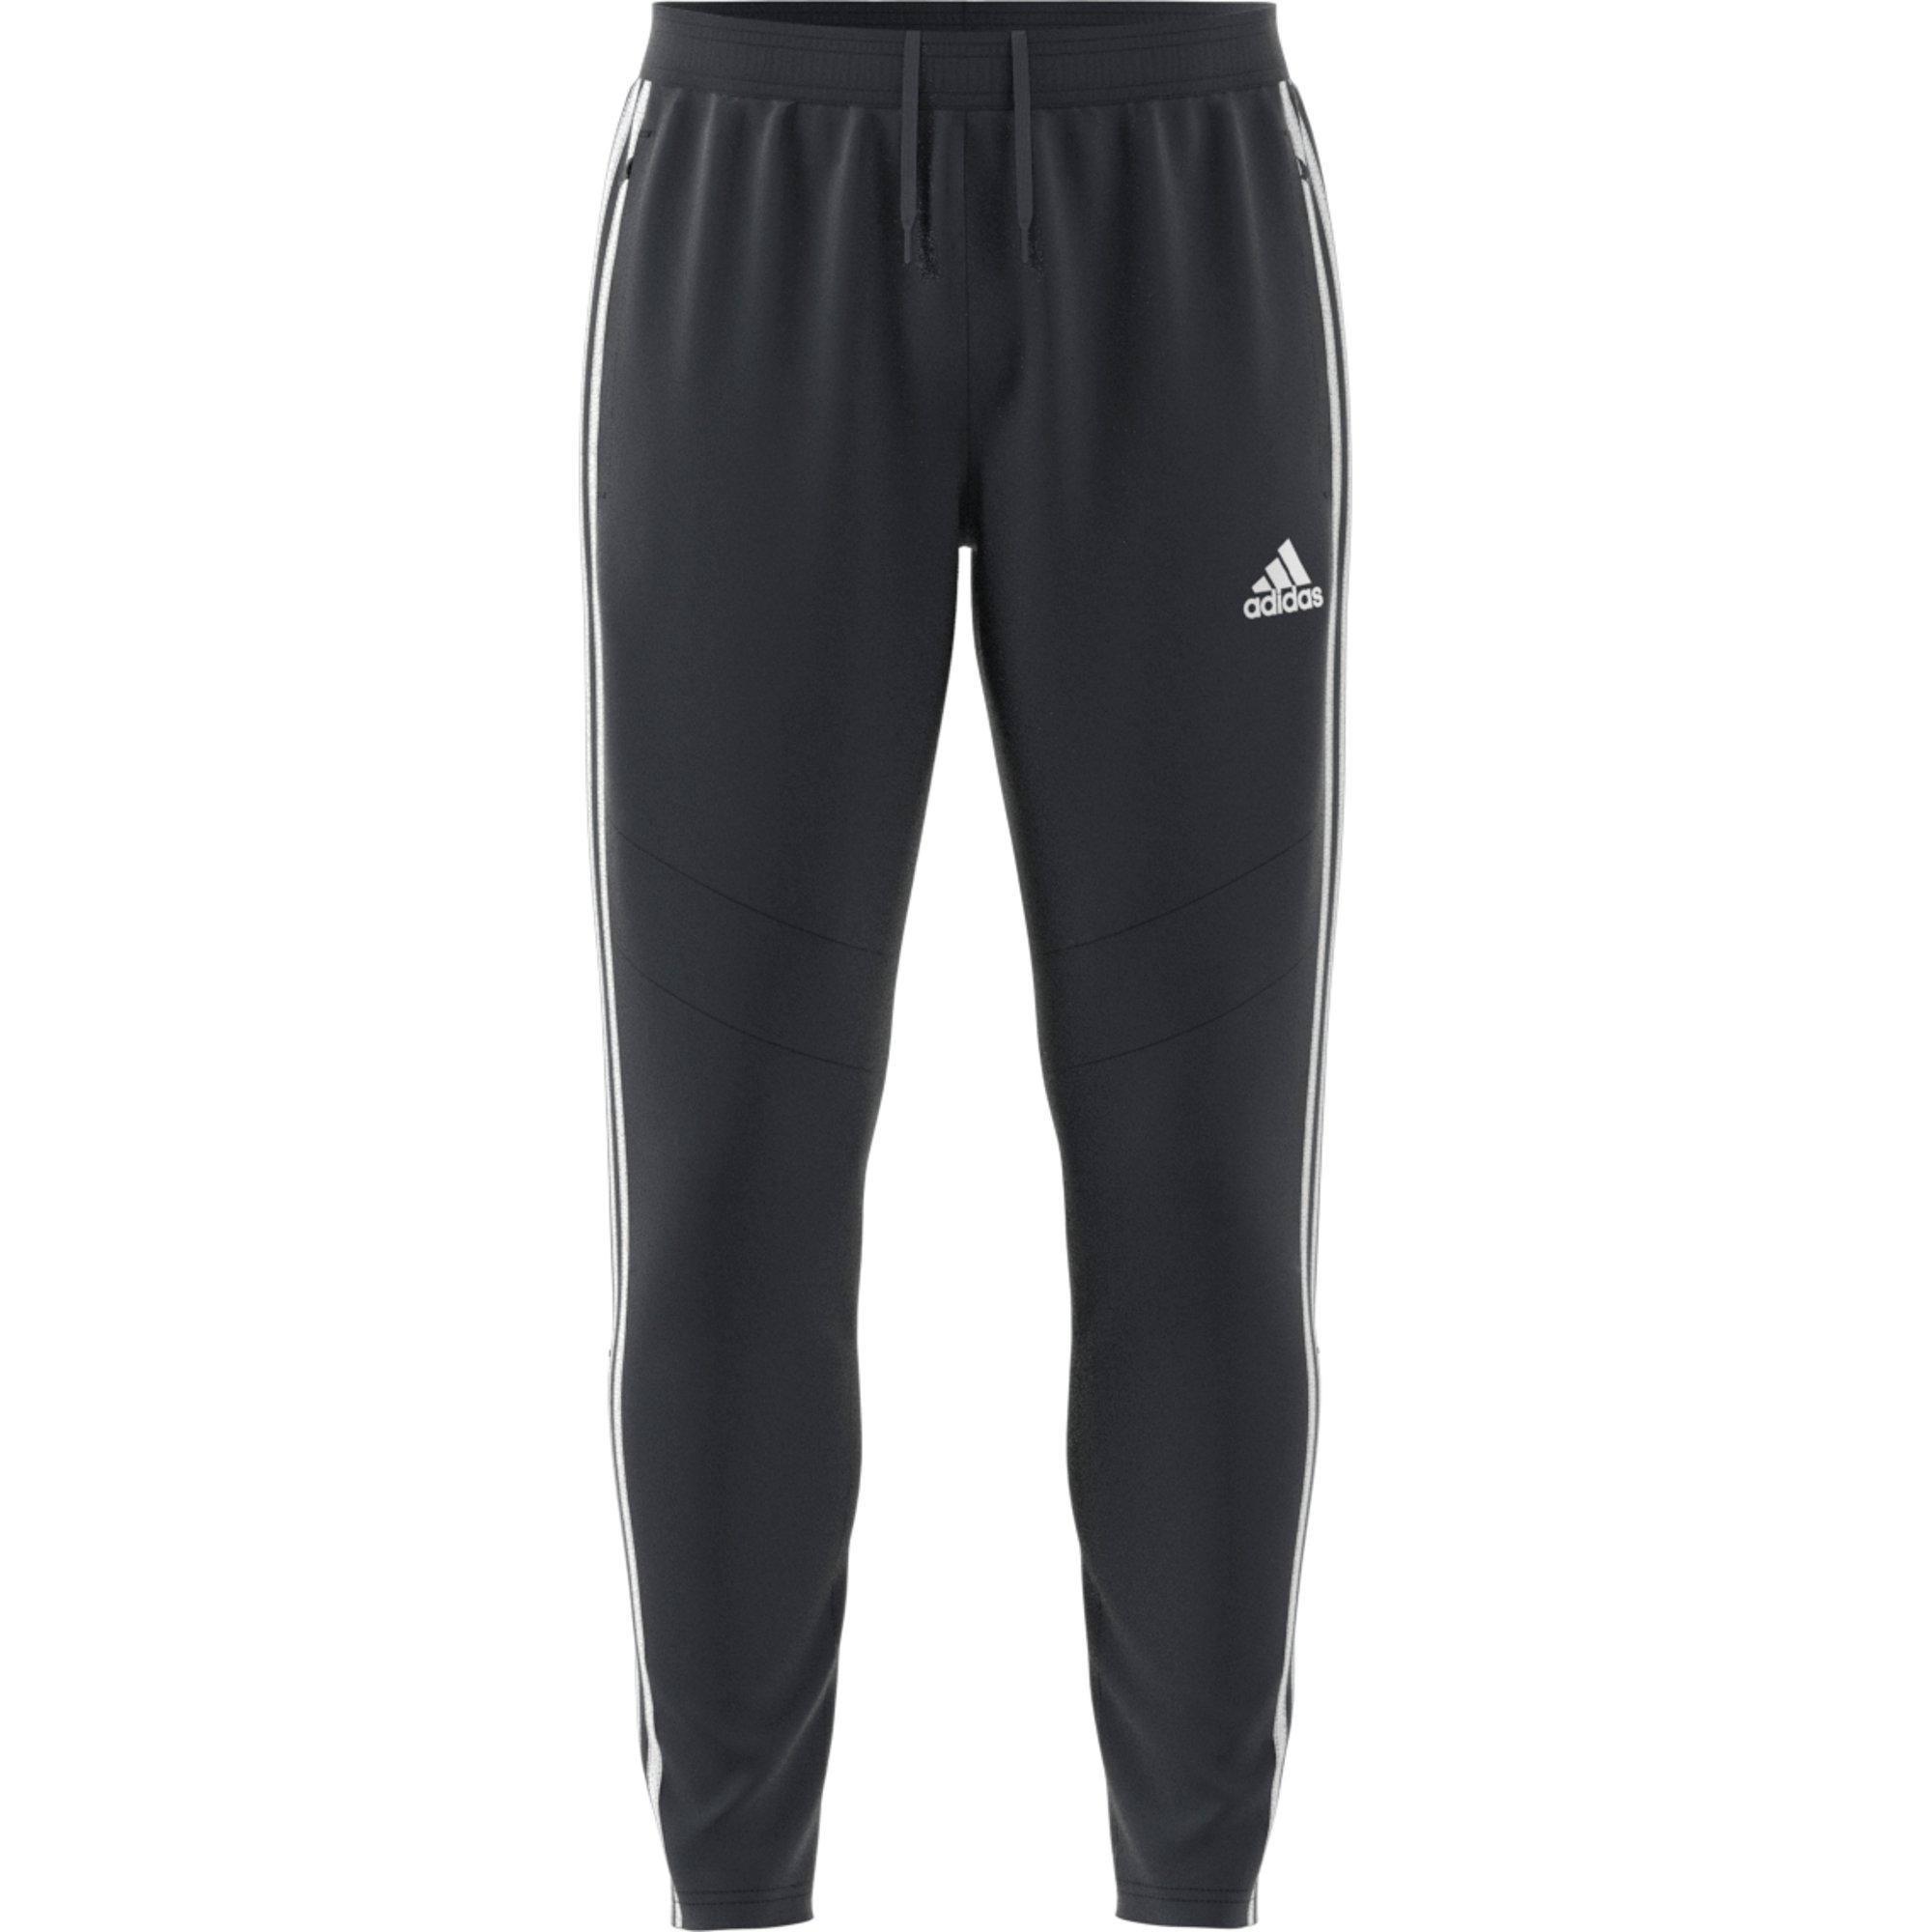 Tiro Adidas uomo da allenamento Pantaloni scurobianco per 19LGrigio nkNOP08wX